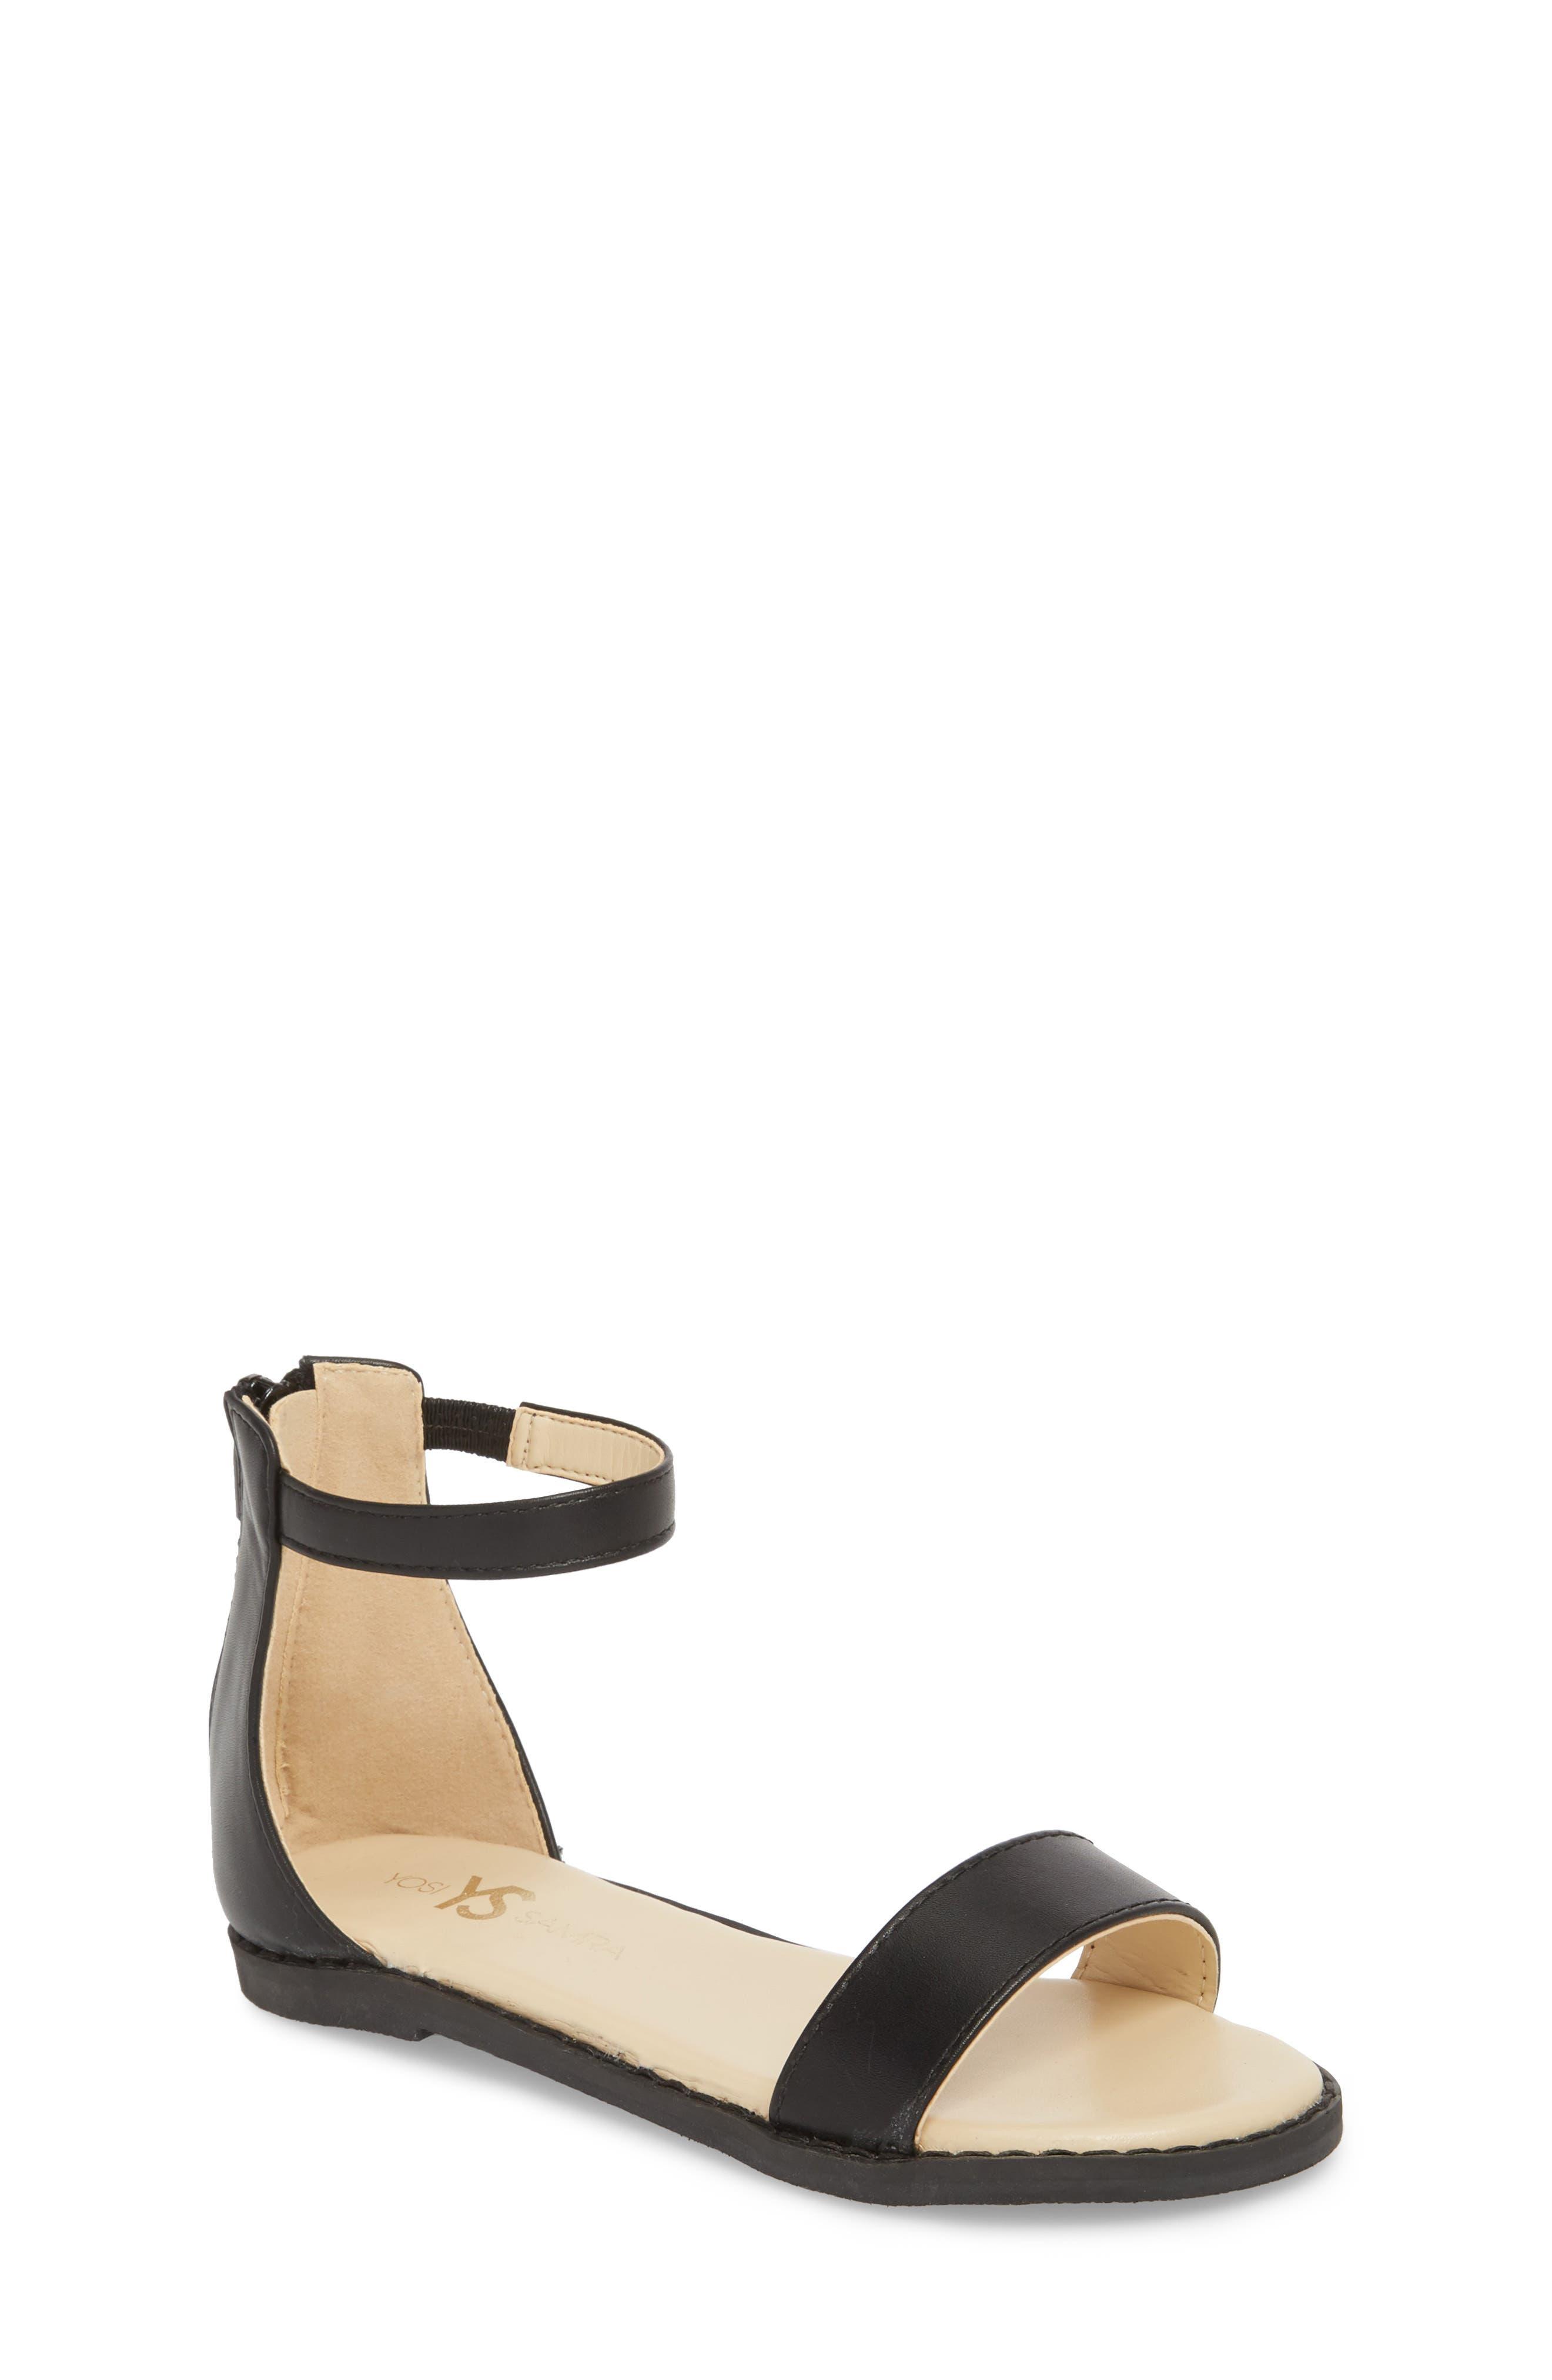 Cambelle Sandal,                         Main,                         color, BLACK